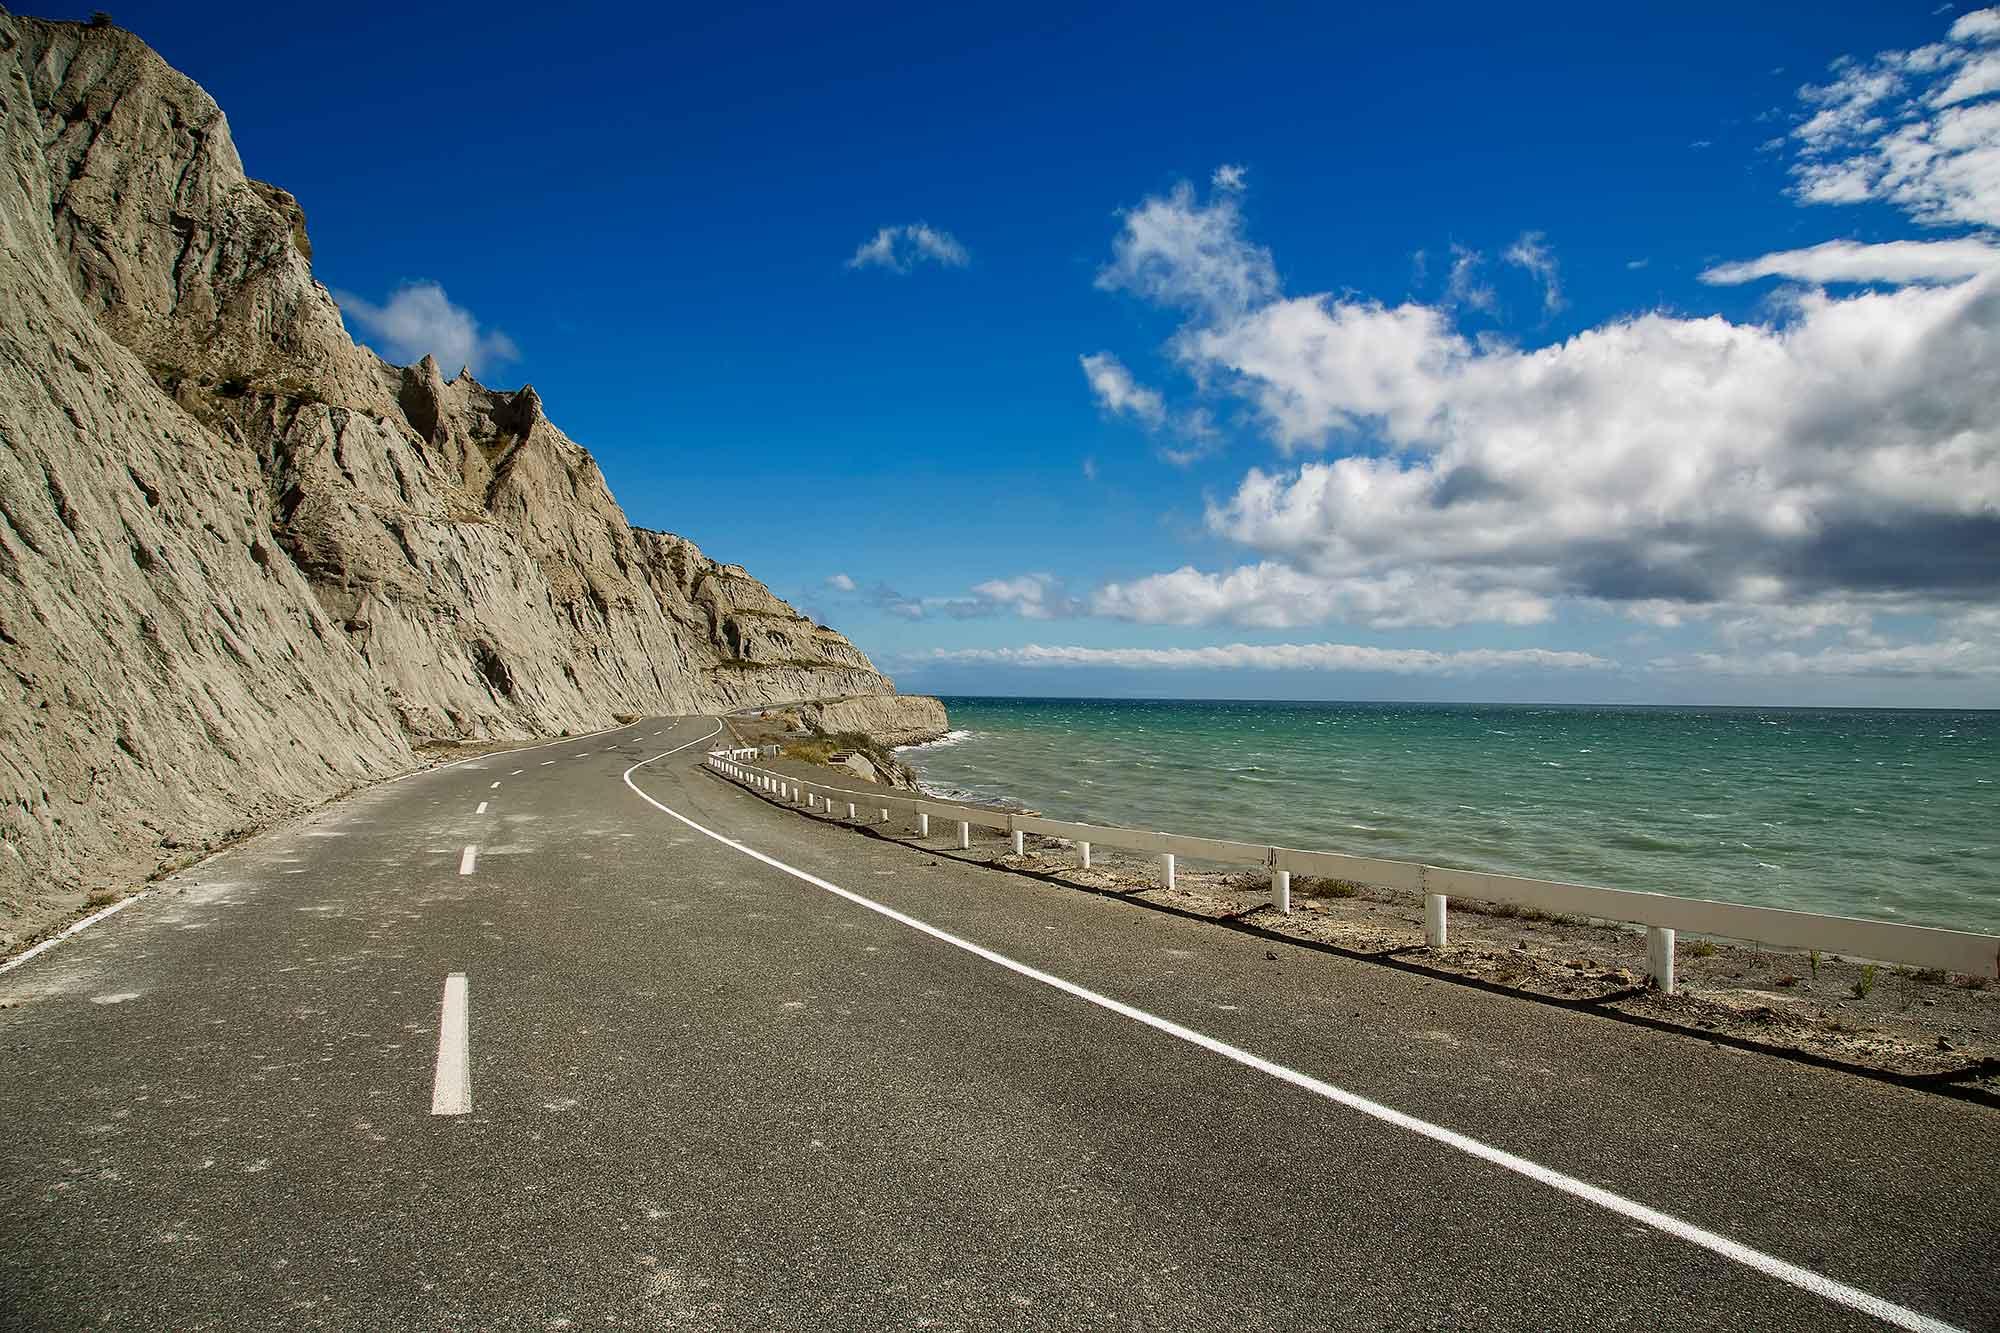 Ocean road on Cape Palliser, New Zealand. © Ulli Maier & Nisa Maier